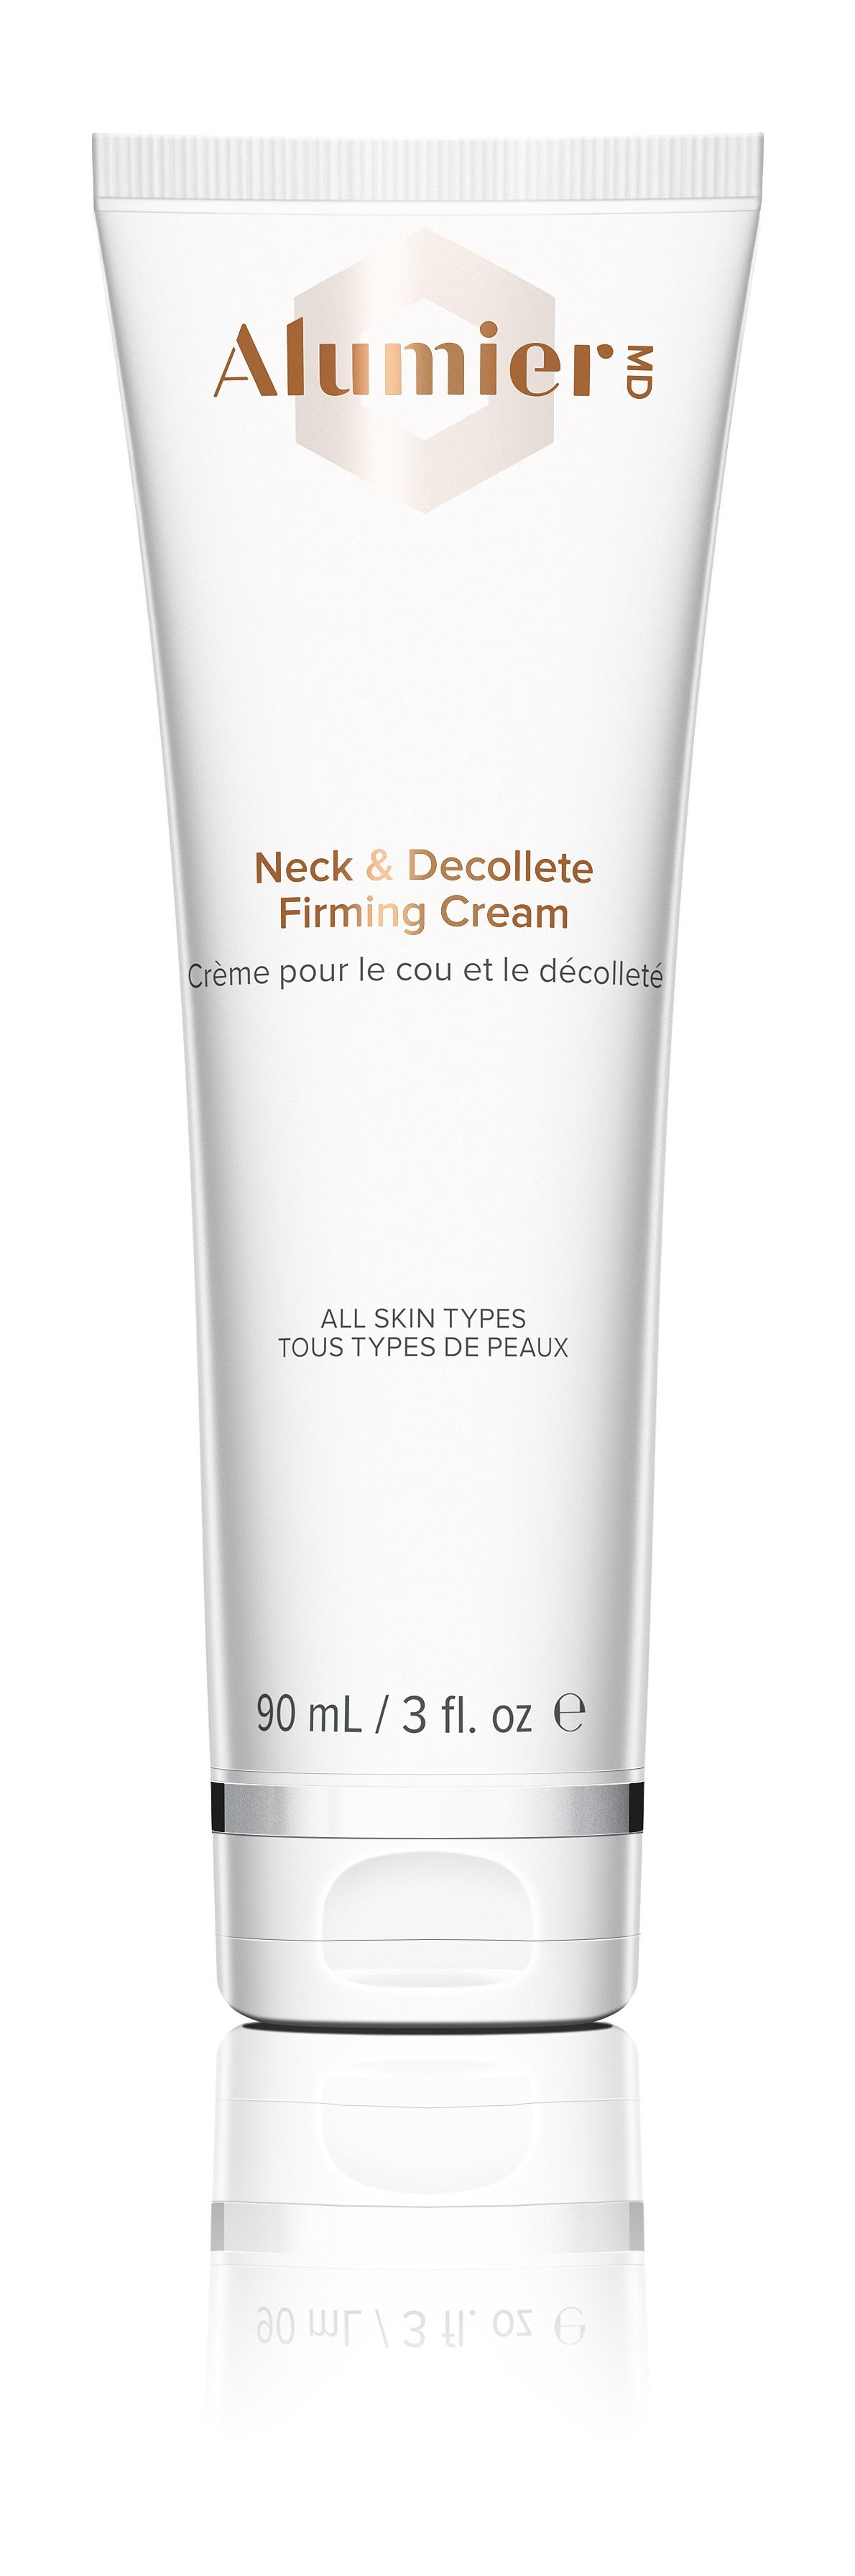 AlumierMD Neck & Décolleté Firming Cream